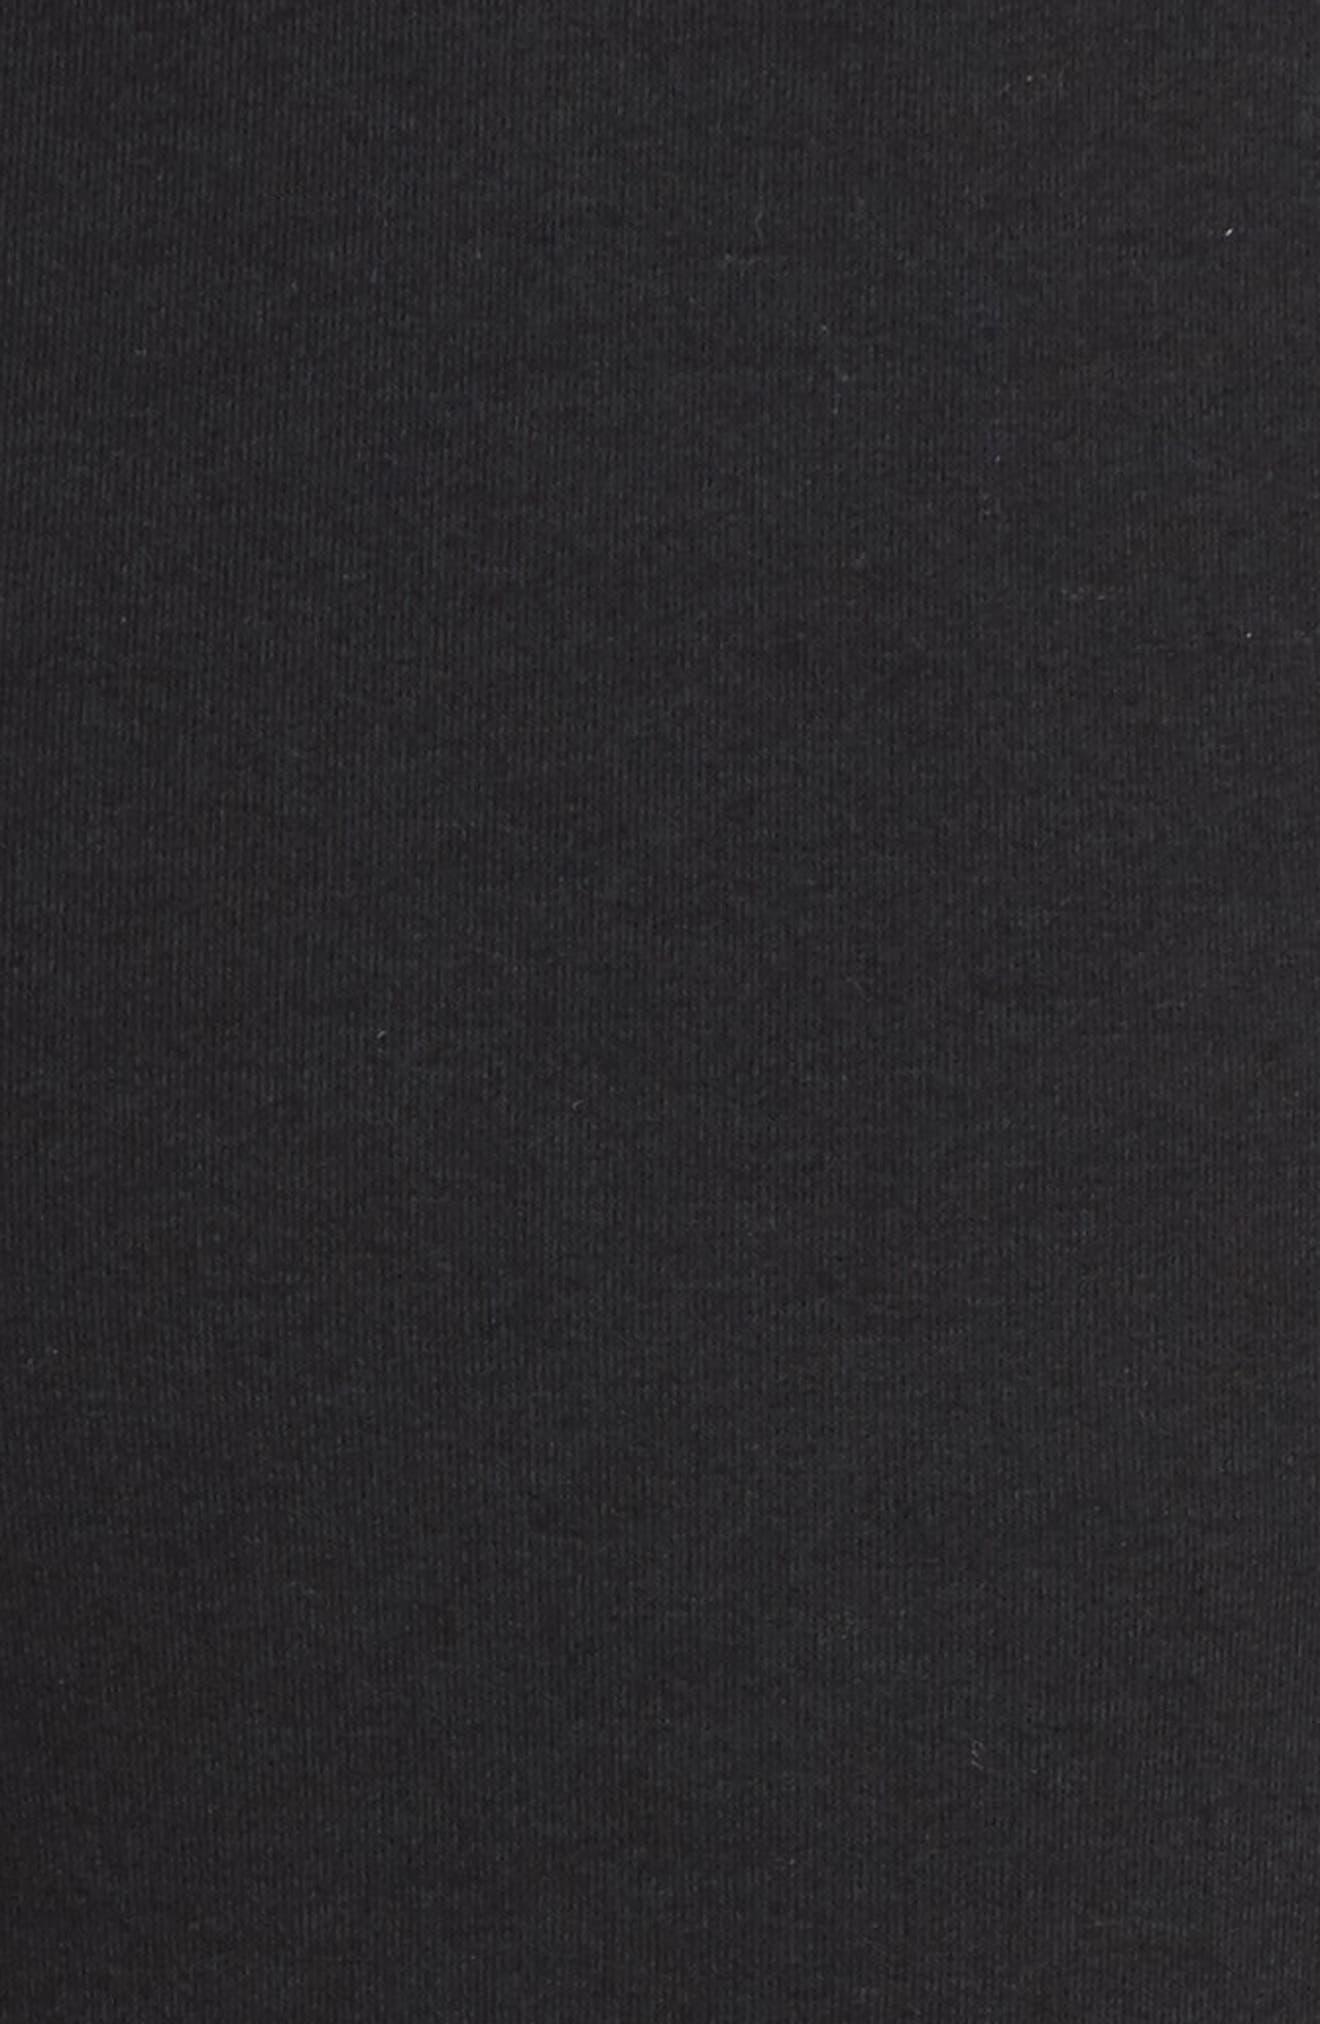 Lounge Jogger Pants,                             Alternate thumbnail 8, color,                             Black